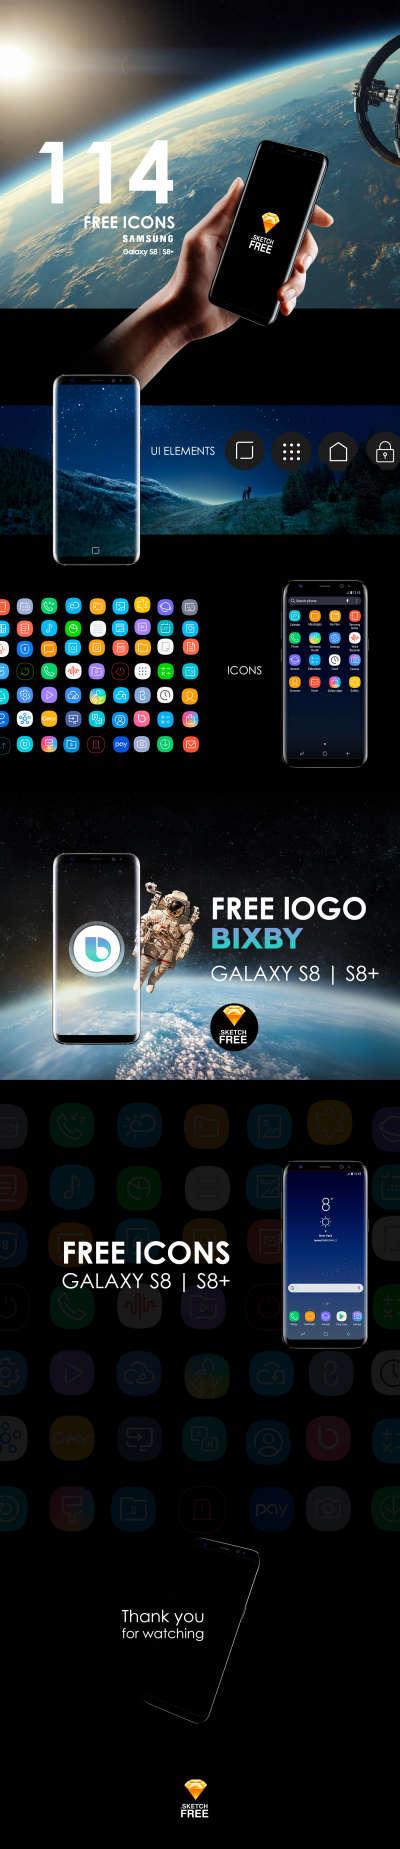 Free Icons Galaxy S8 | S8+